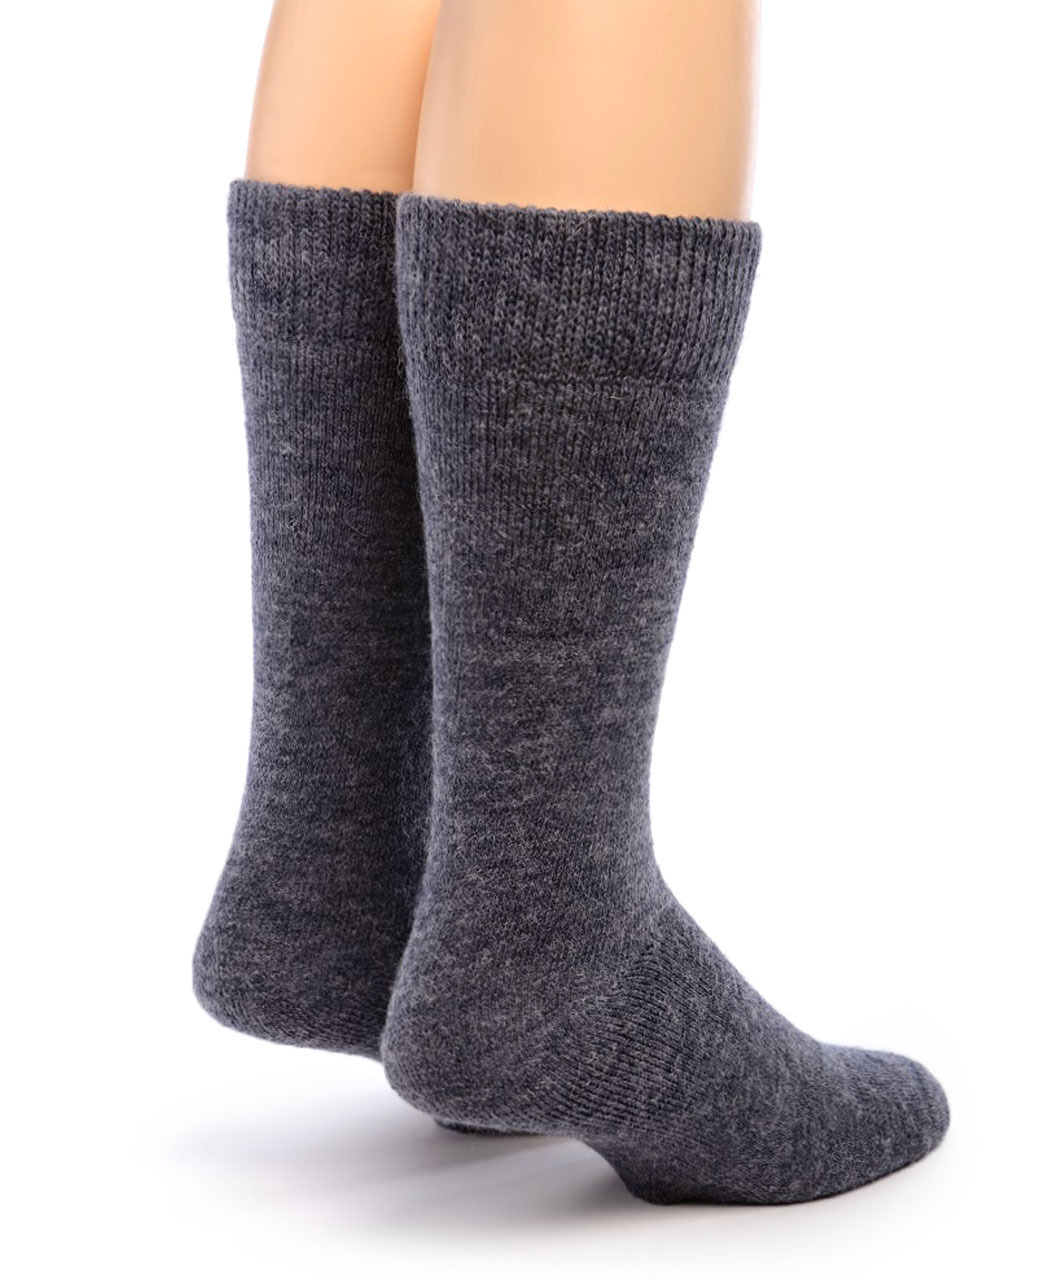 Outdoor Terry Lined Alpaca Socks Back